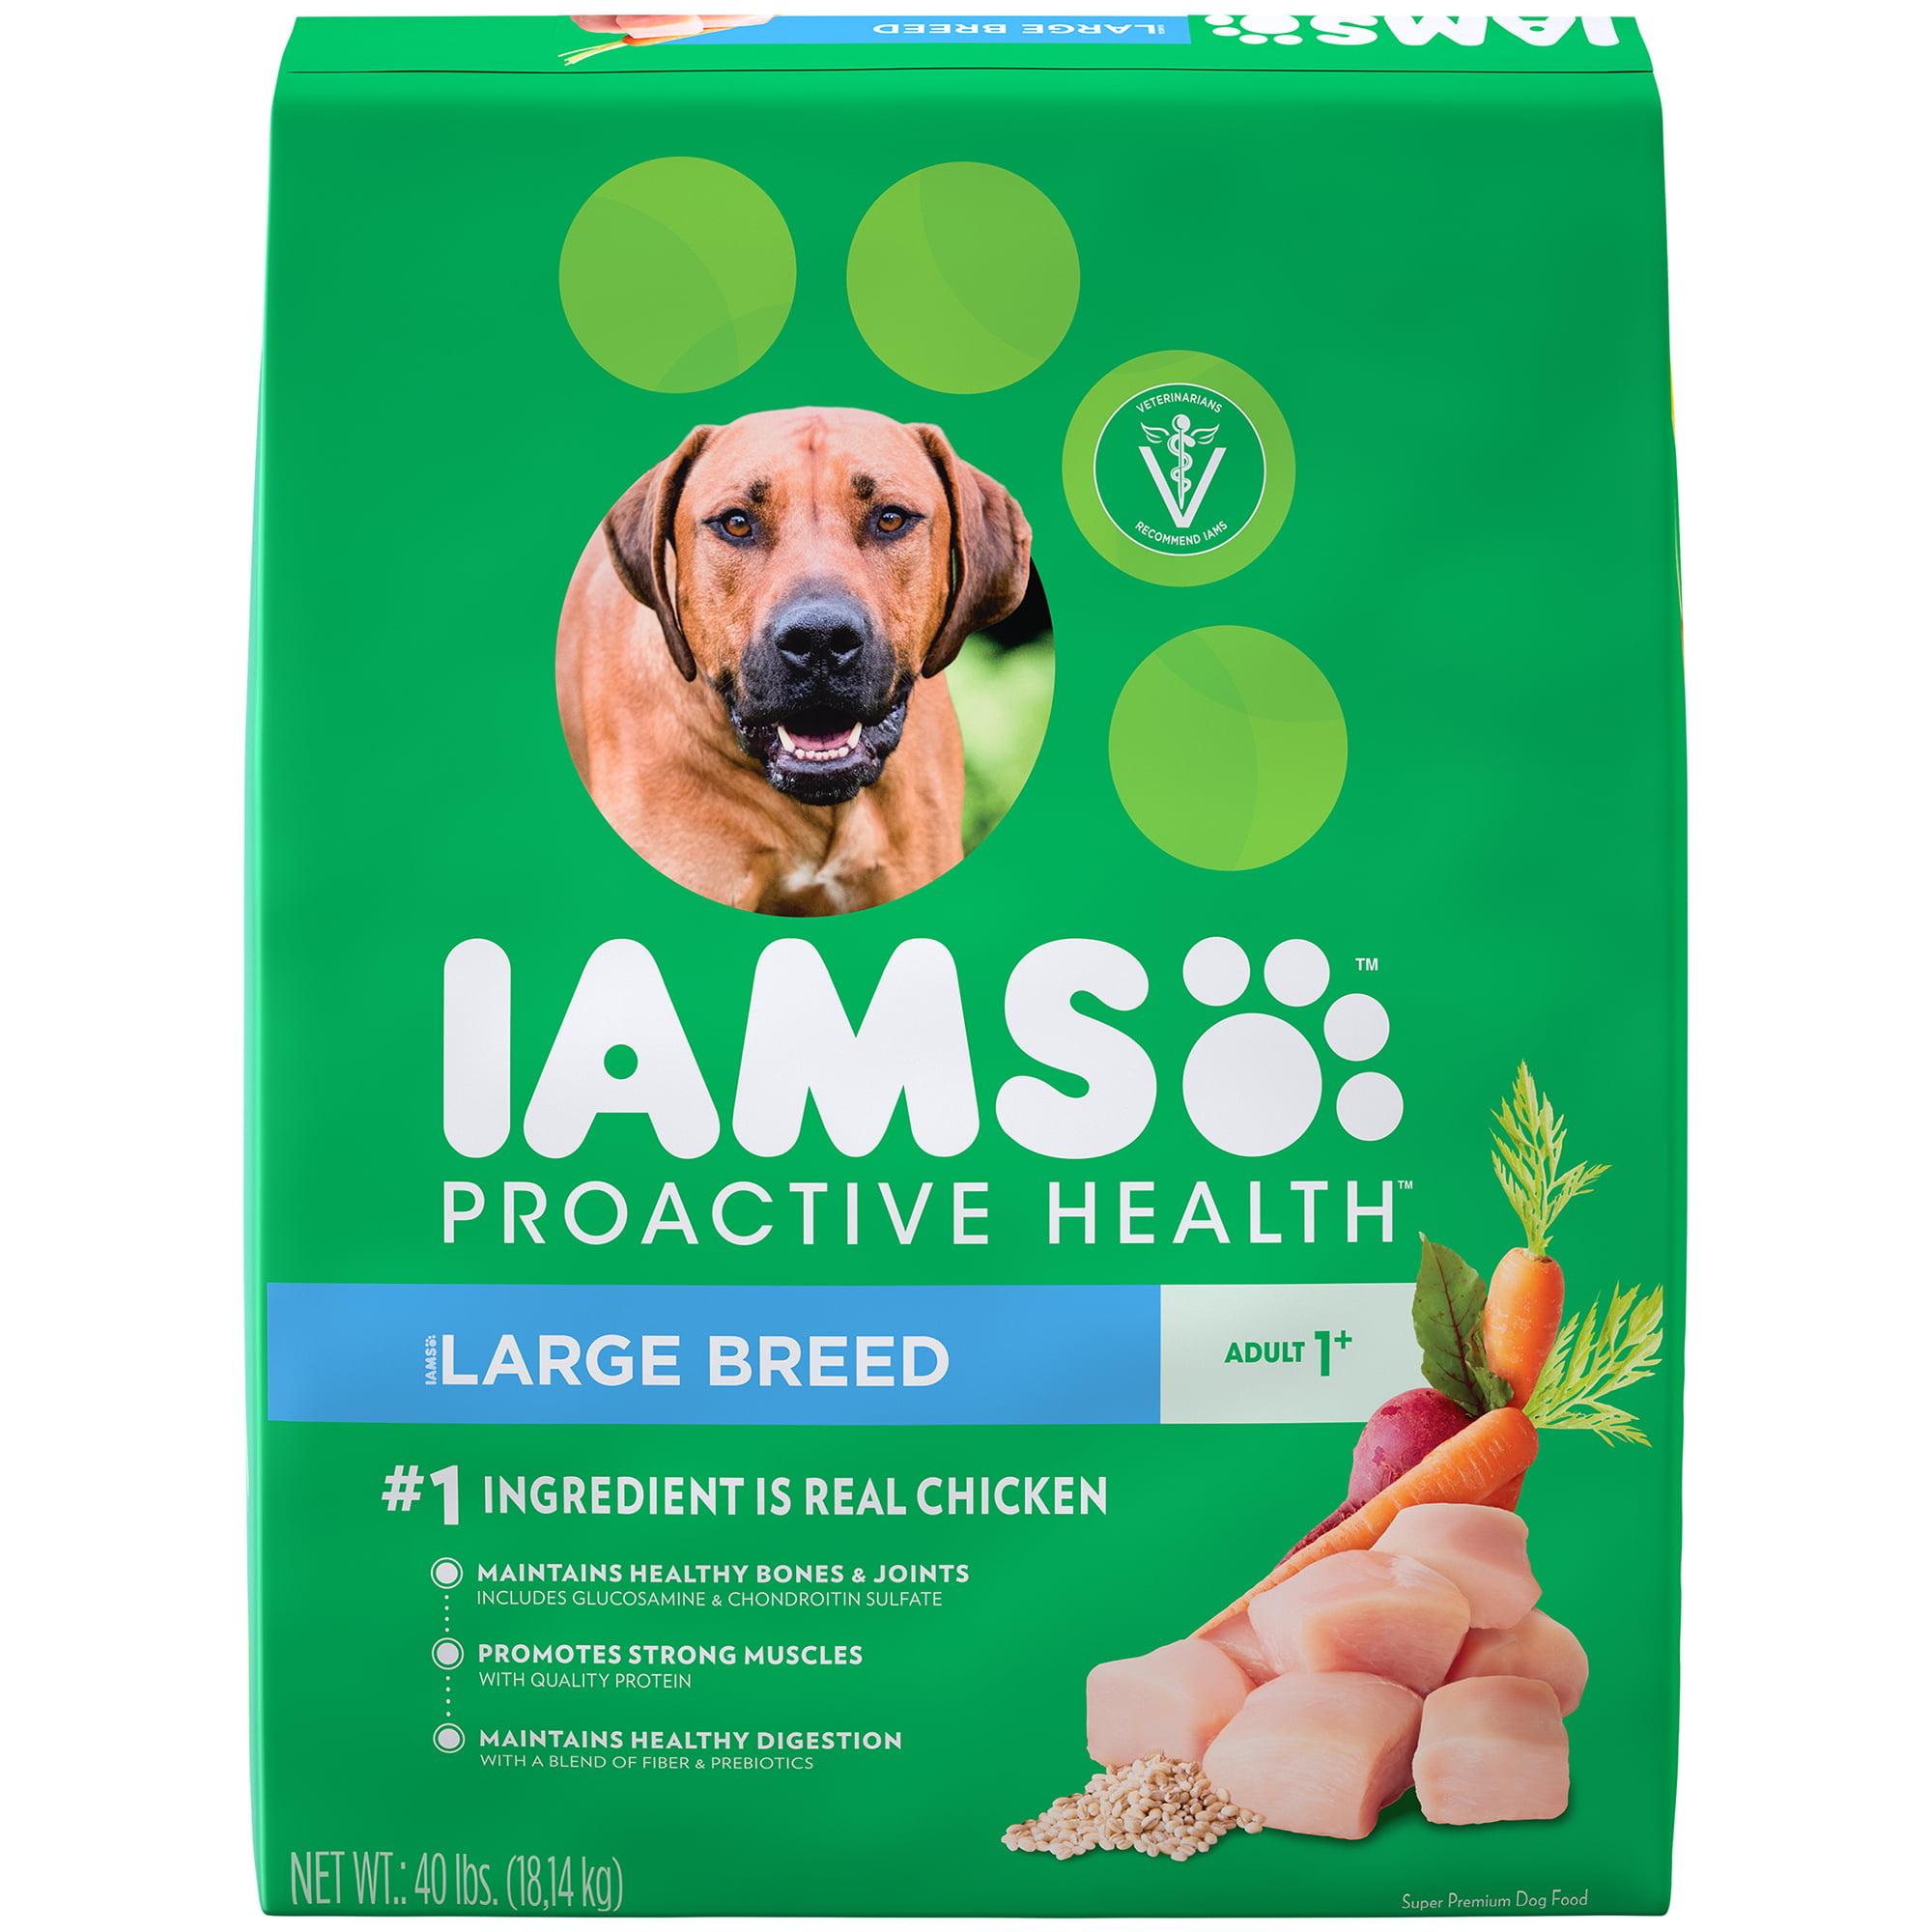 IAMS PROACTIVE HEALTH Adult Large Breed Dry Dog Food Chicken, 40 lb. Bag